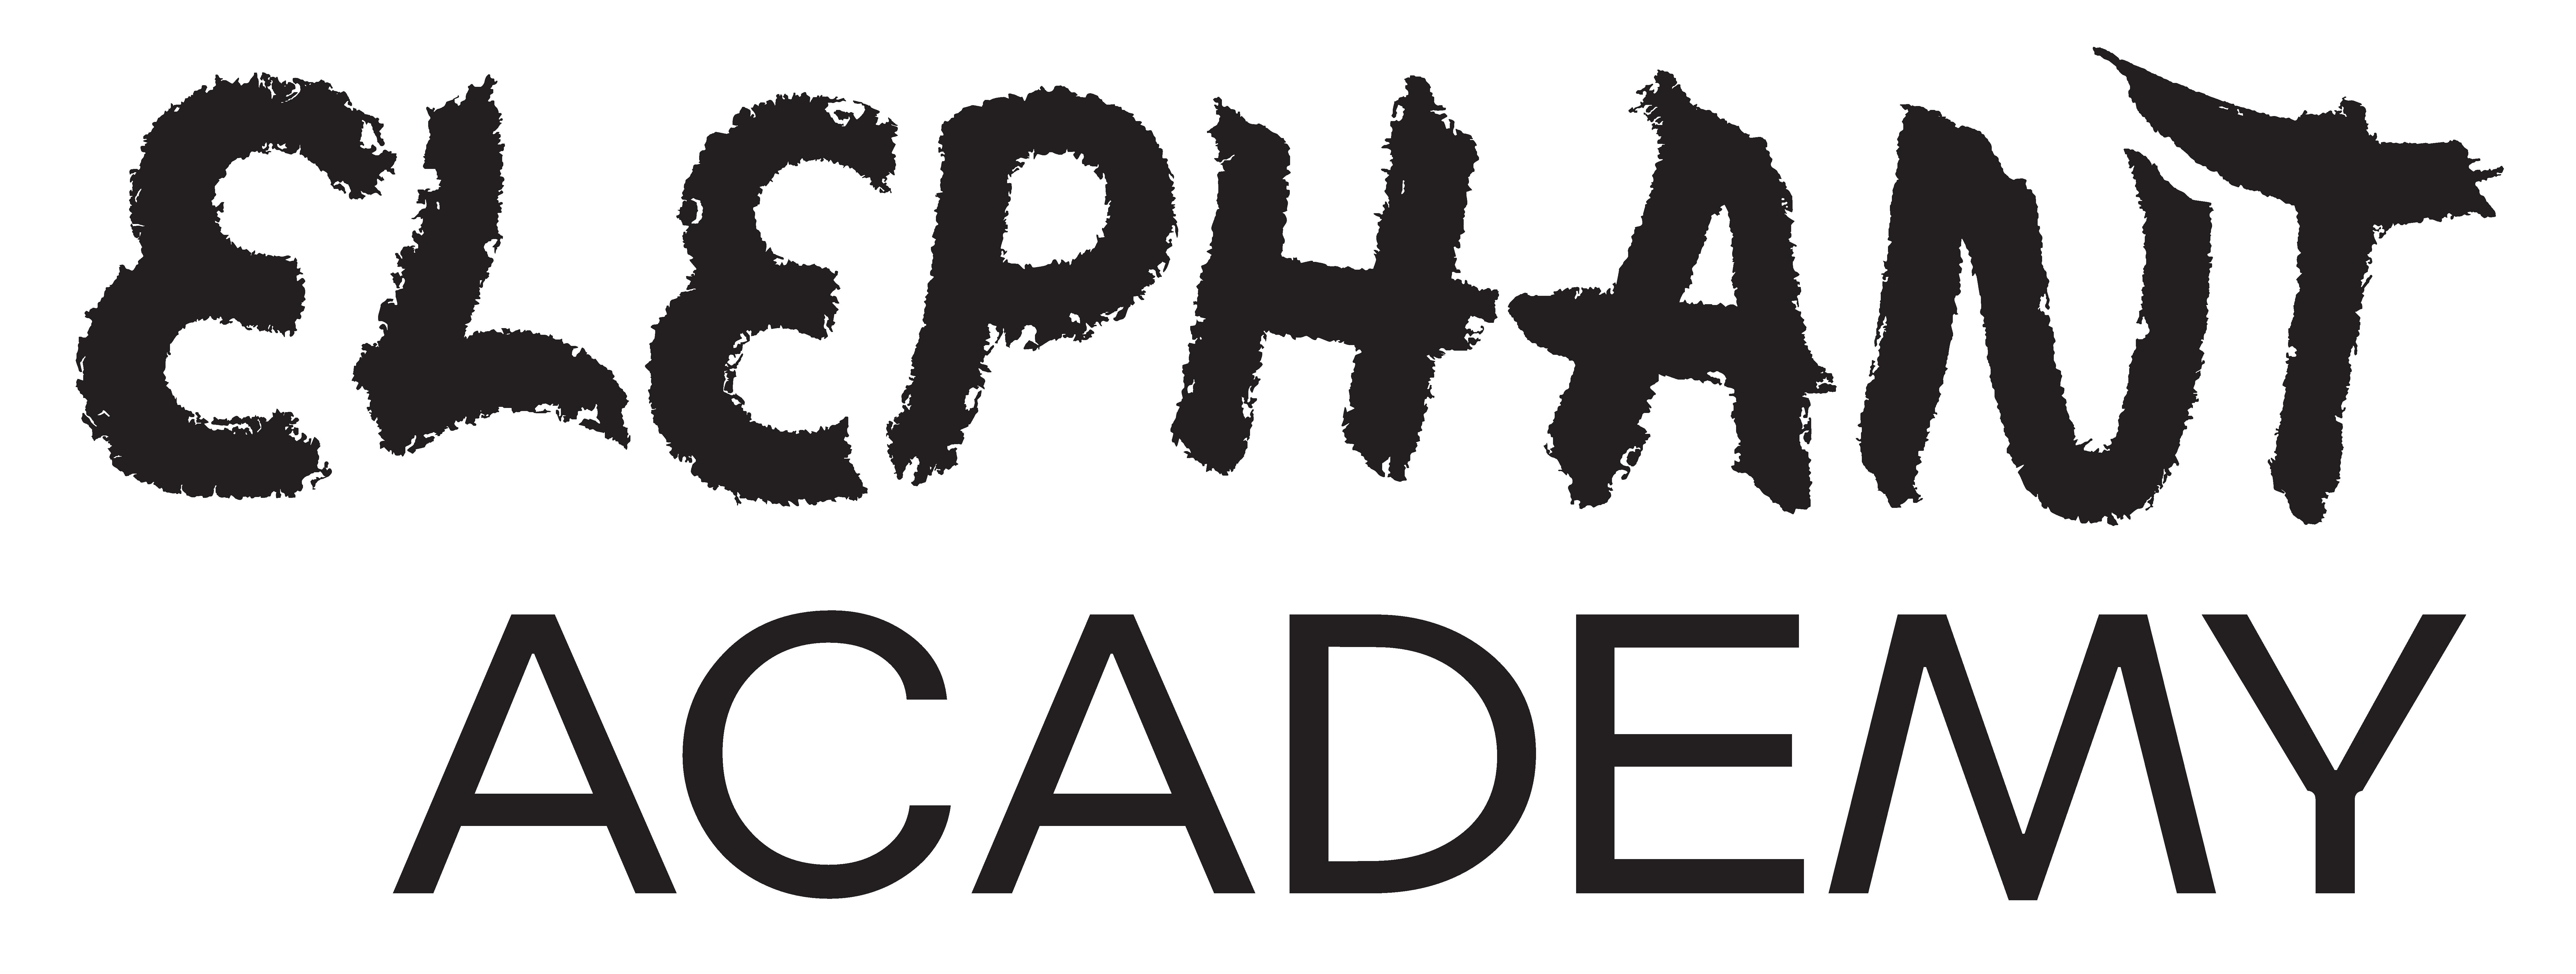 Elephant Academy